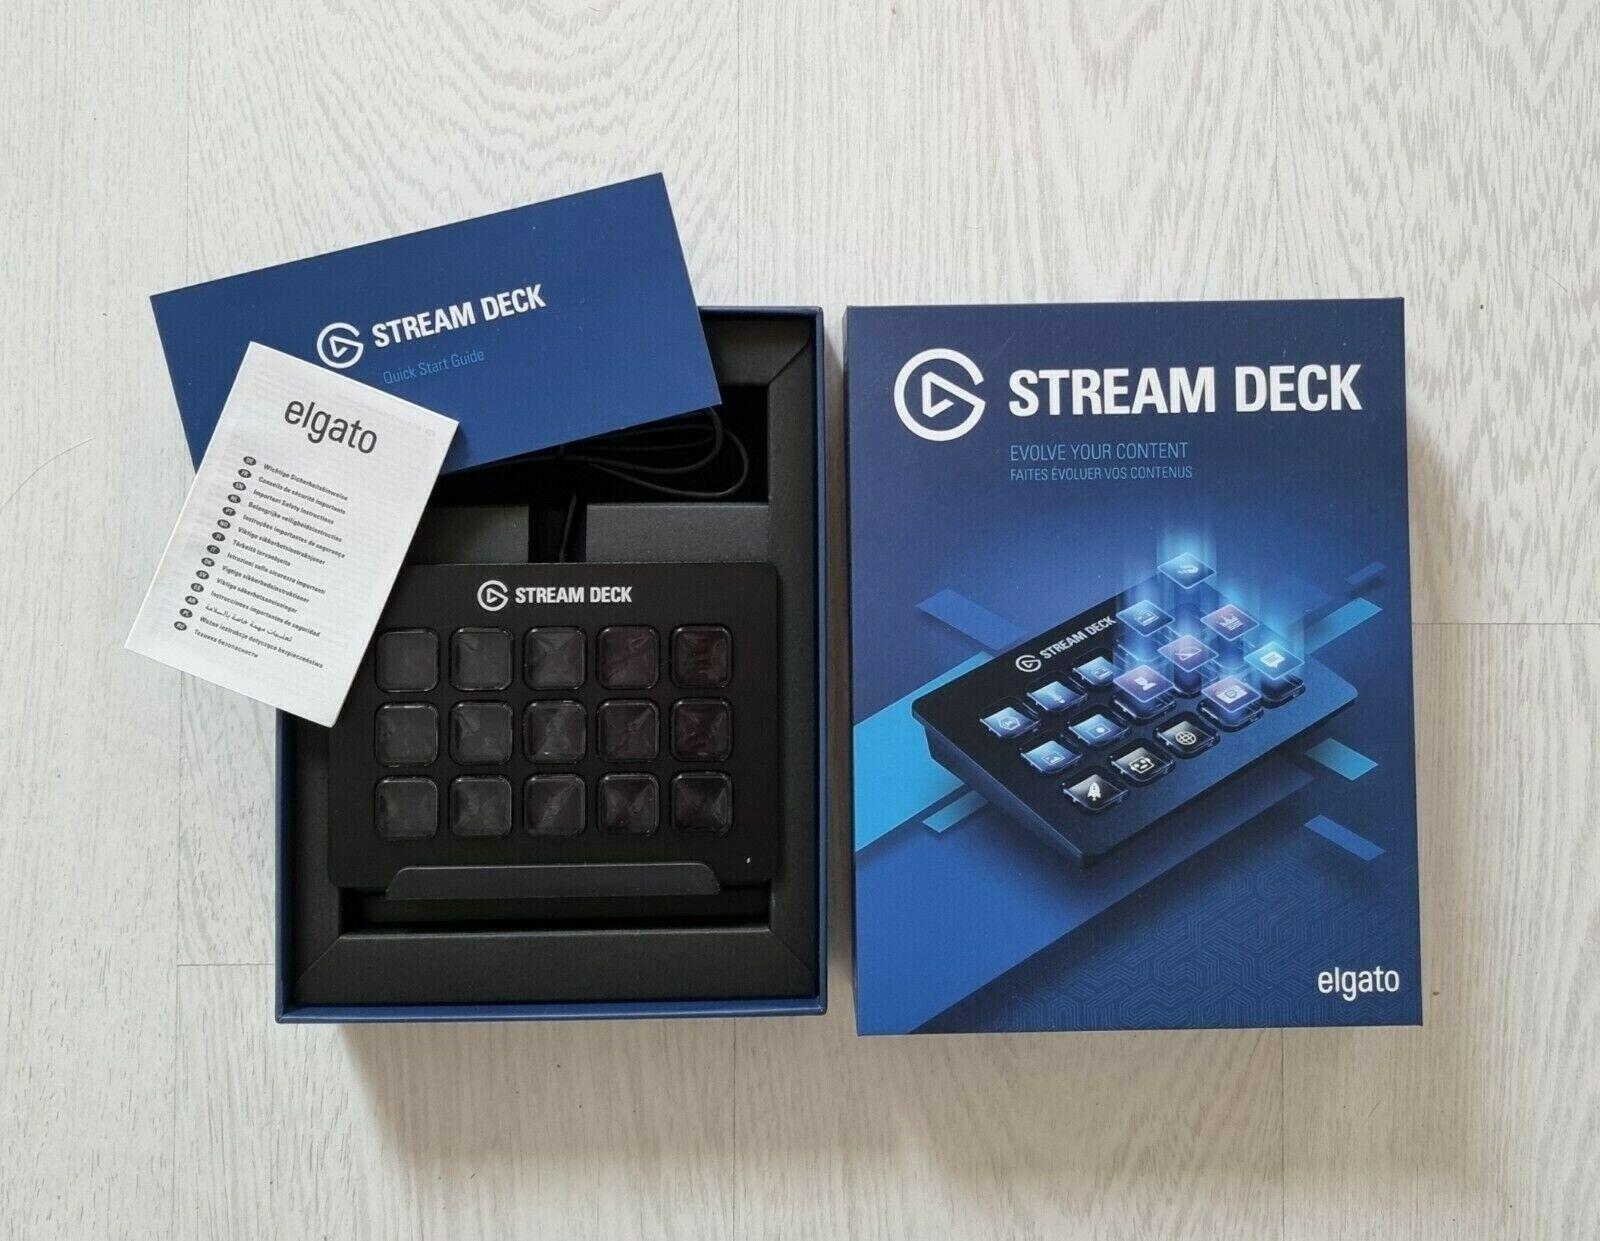 Elgato Stream Deck with 15 Customizable LCD keys